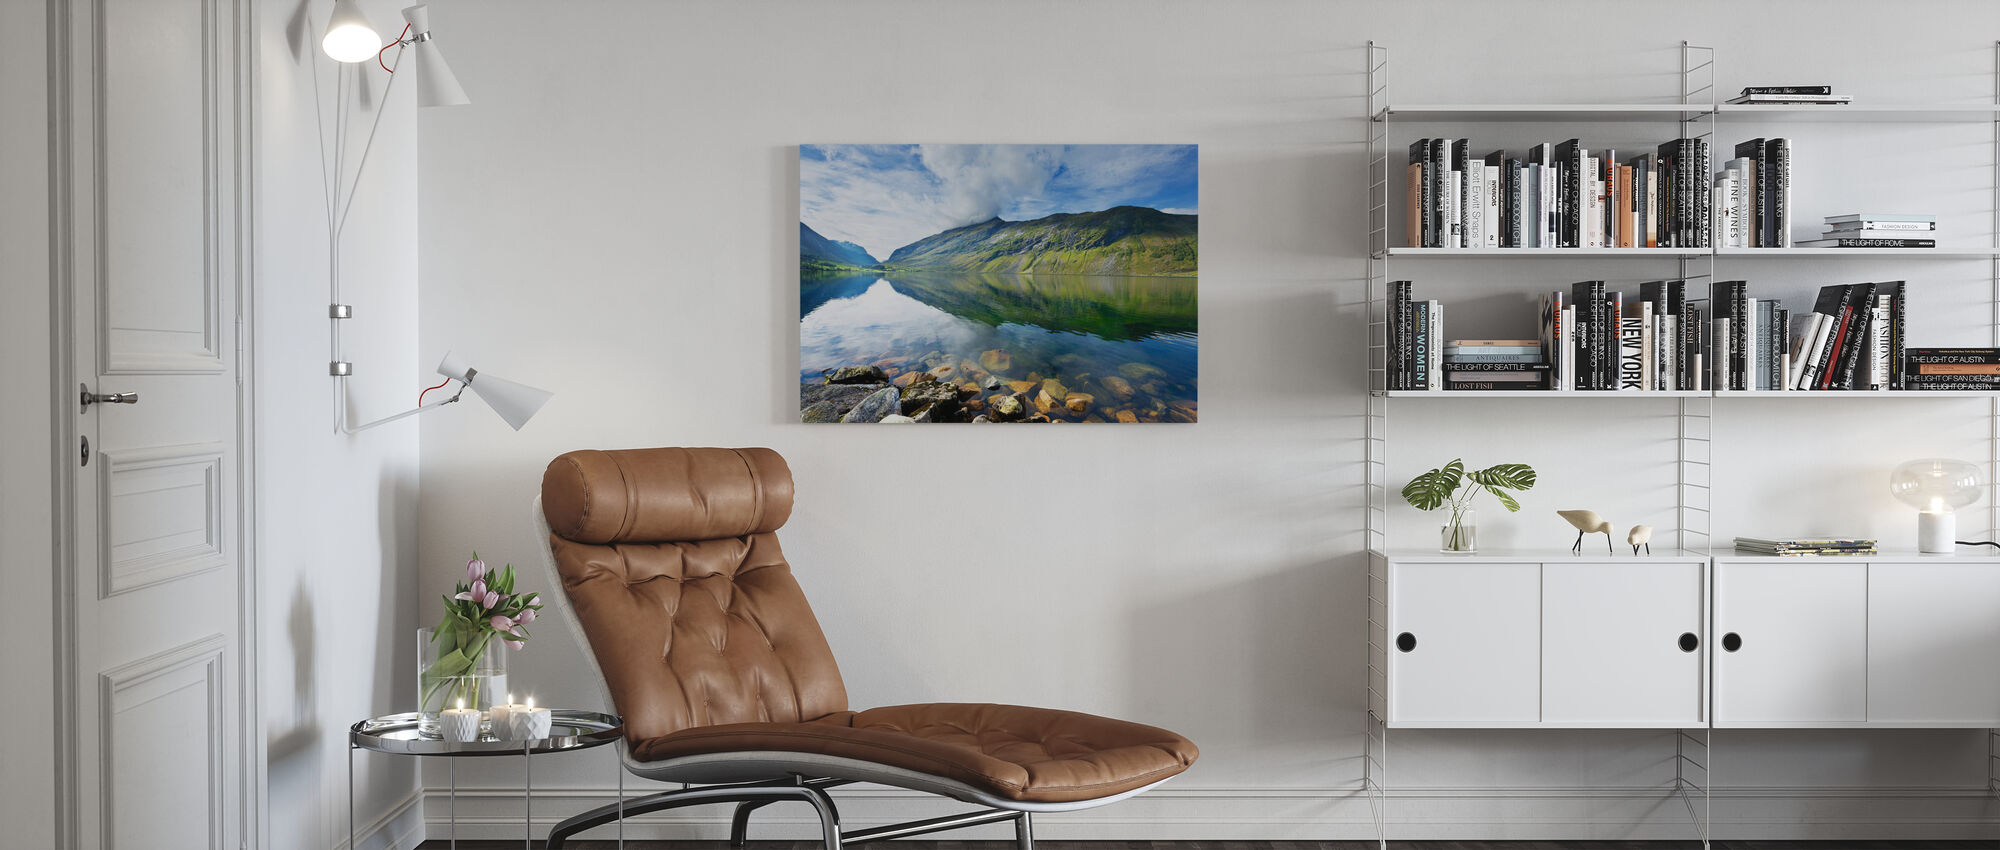 Eidsdal Lake in Geiranger, Norway II - Canvas print - Living Room